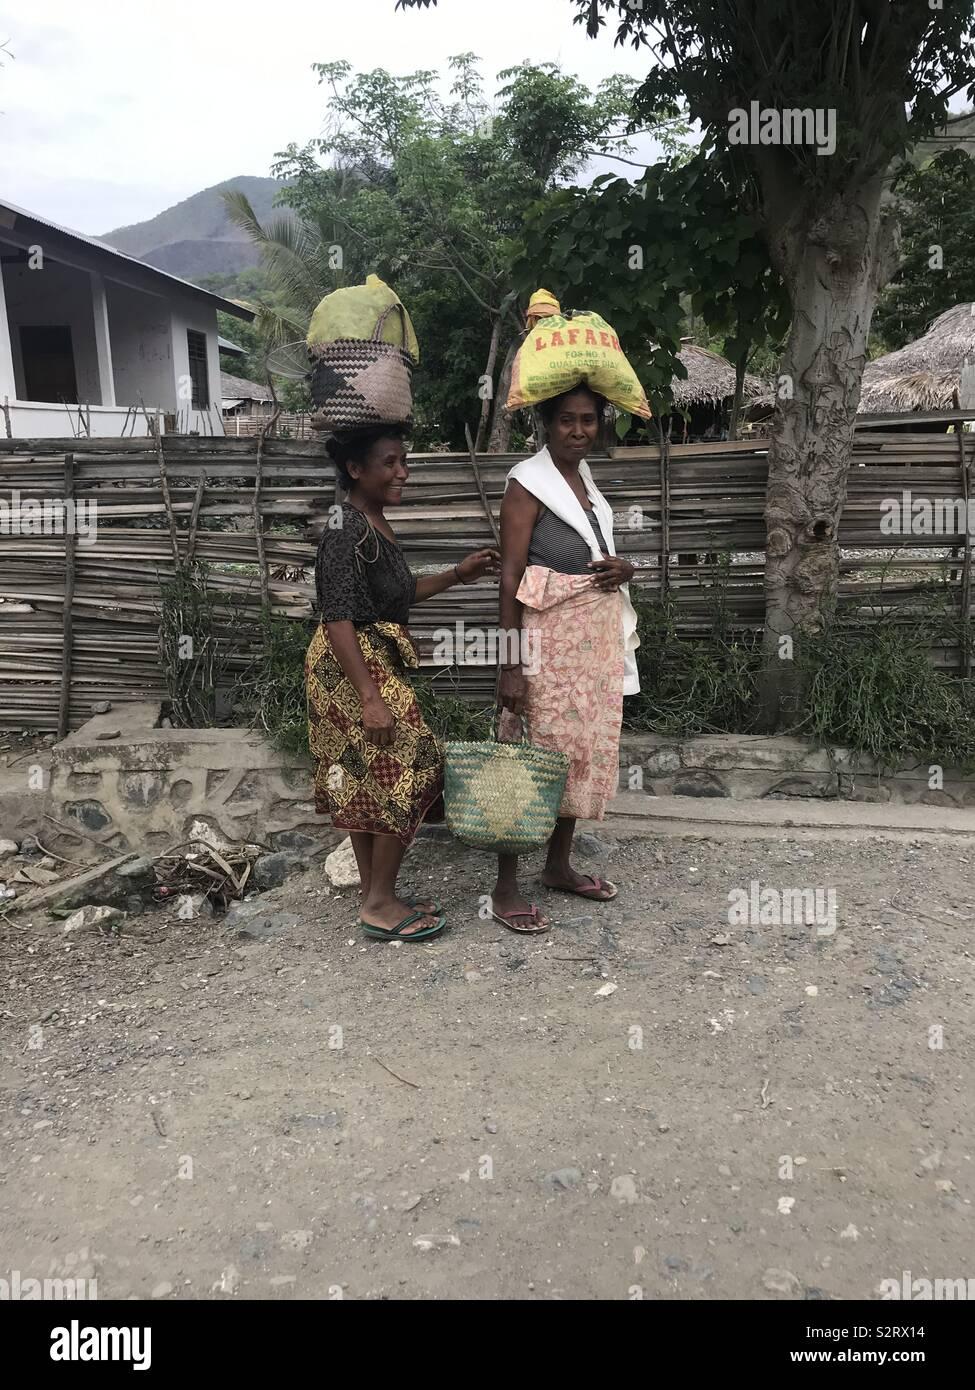 women carrying food to market, Timor Leste Stock Photo